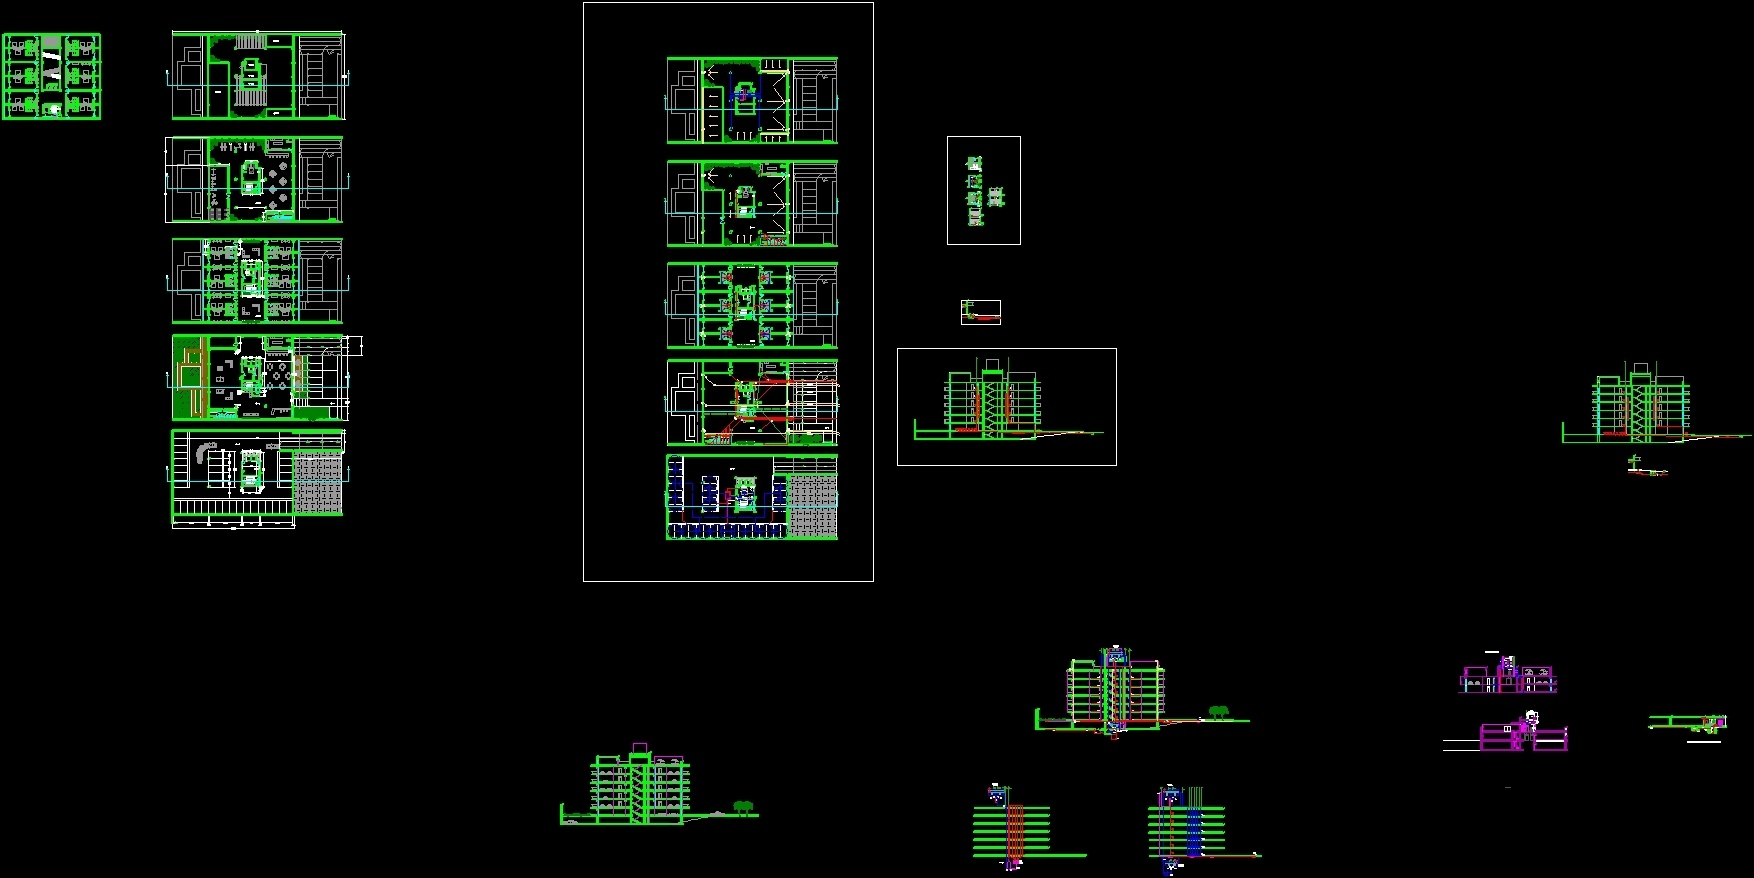 Building Installations Dwg Block For Autocad Designs Cad